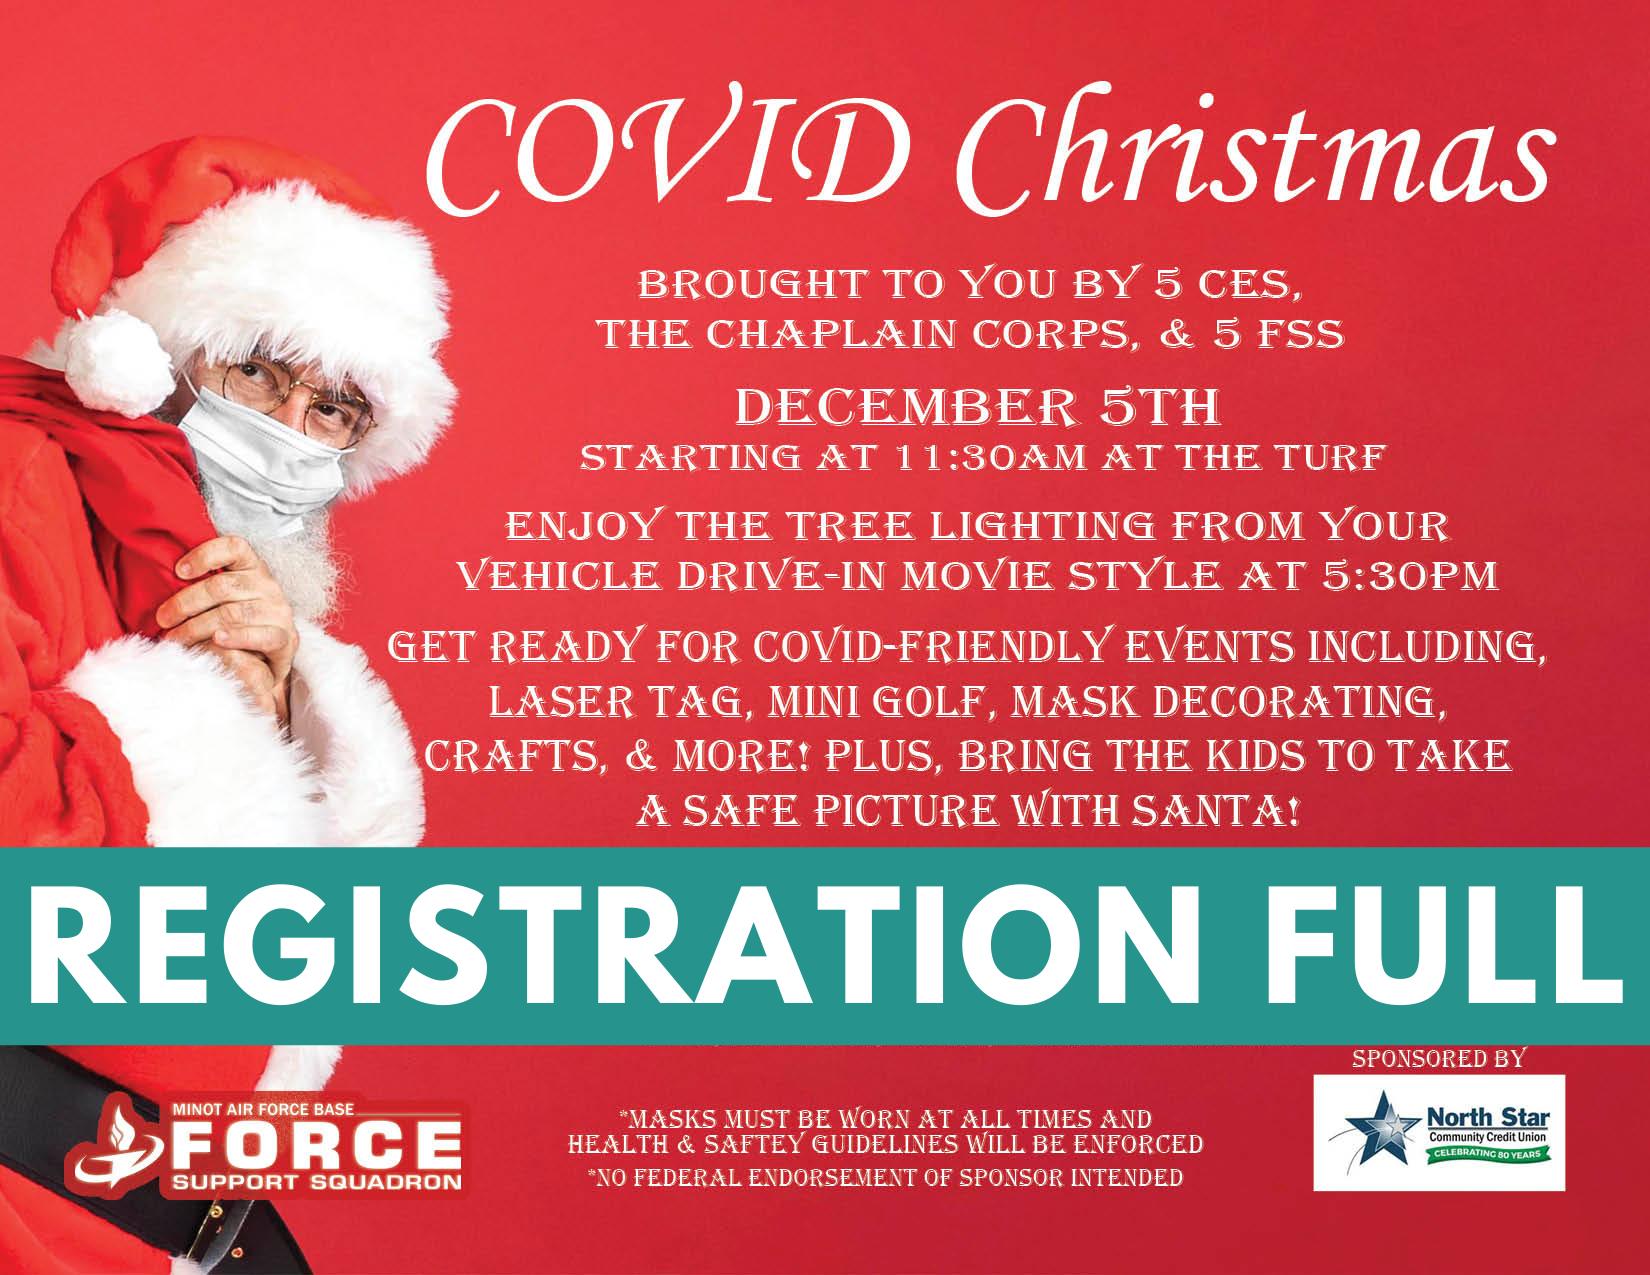 COVID Christmas - Registration Full